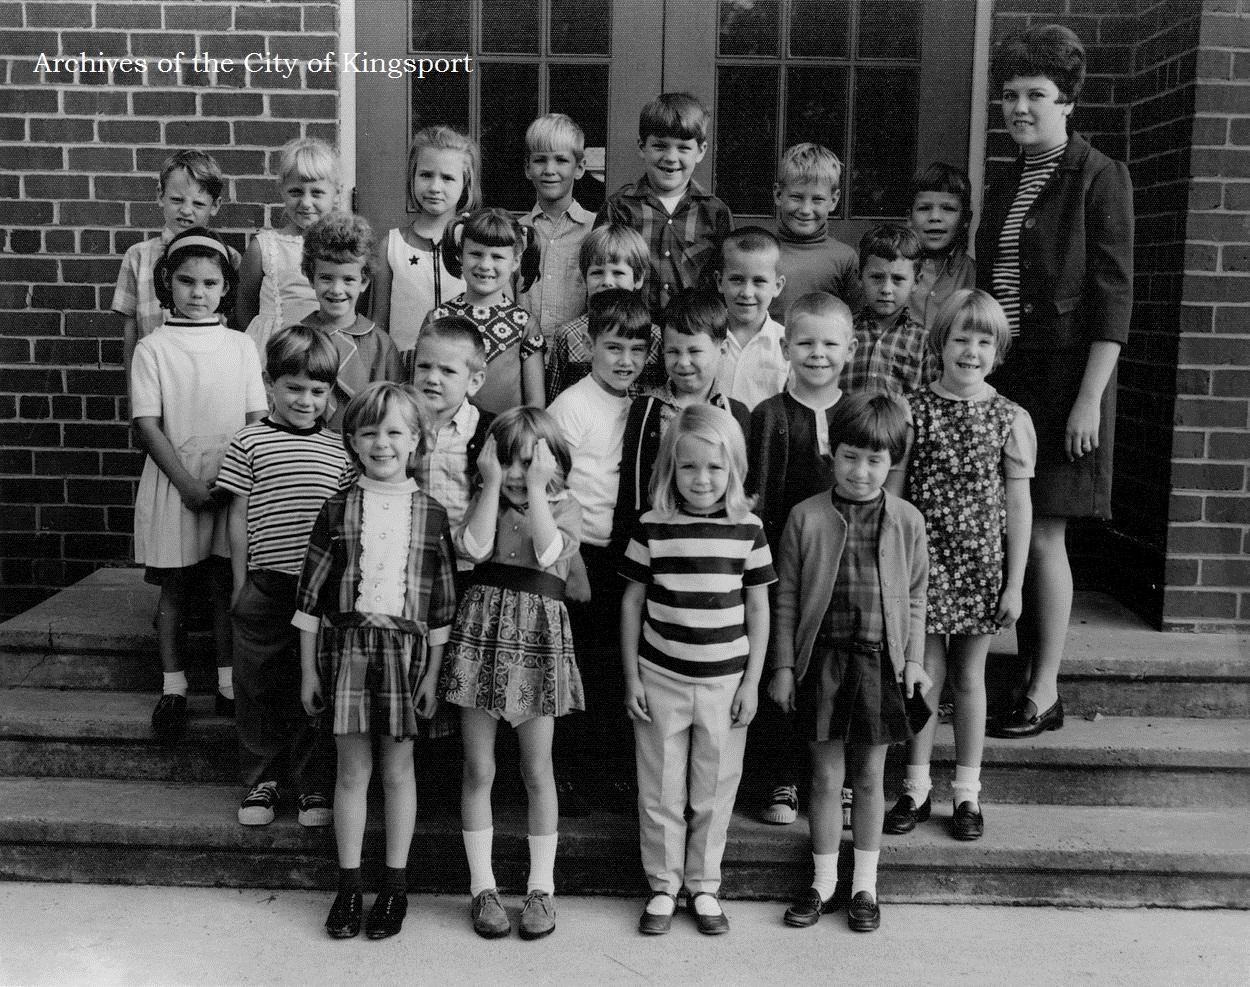 Kingsport School Days Archiventures